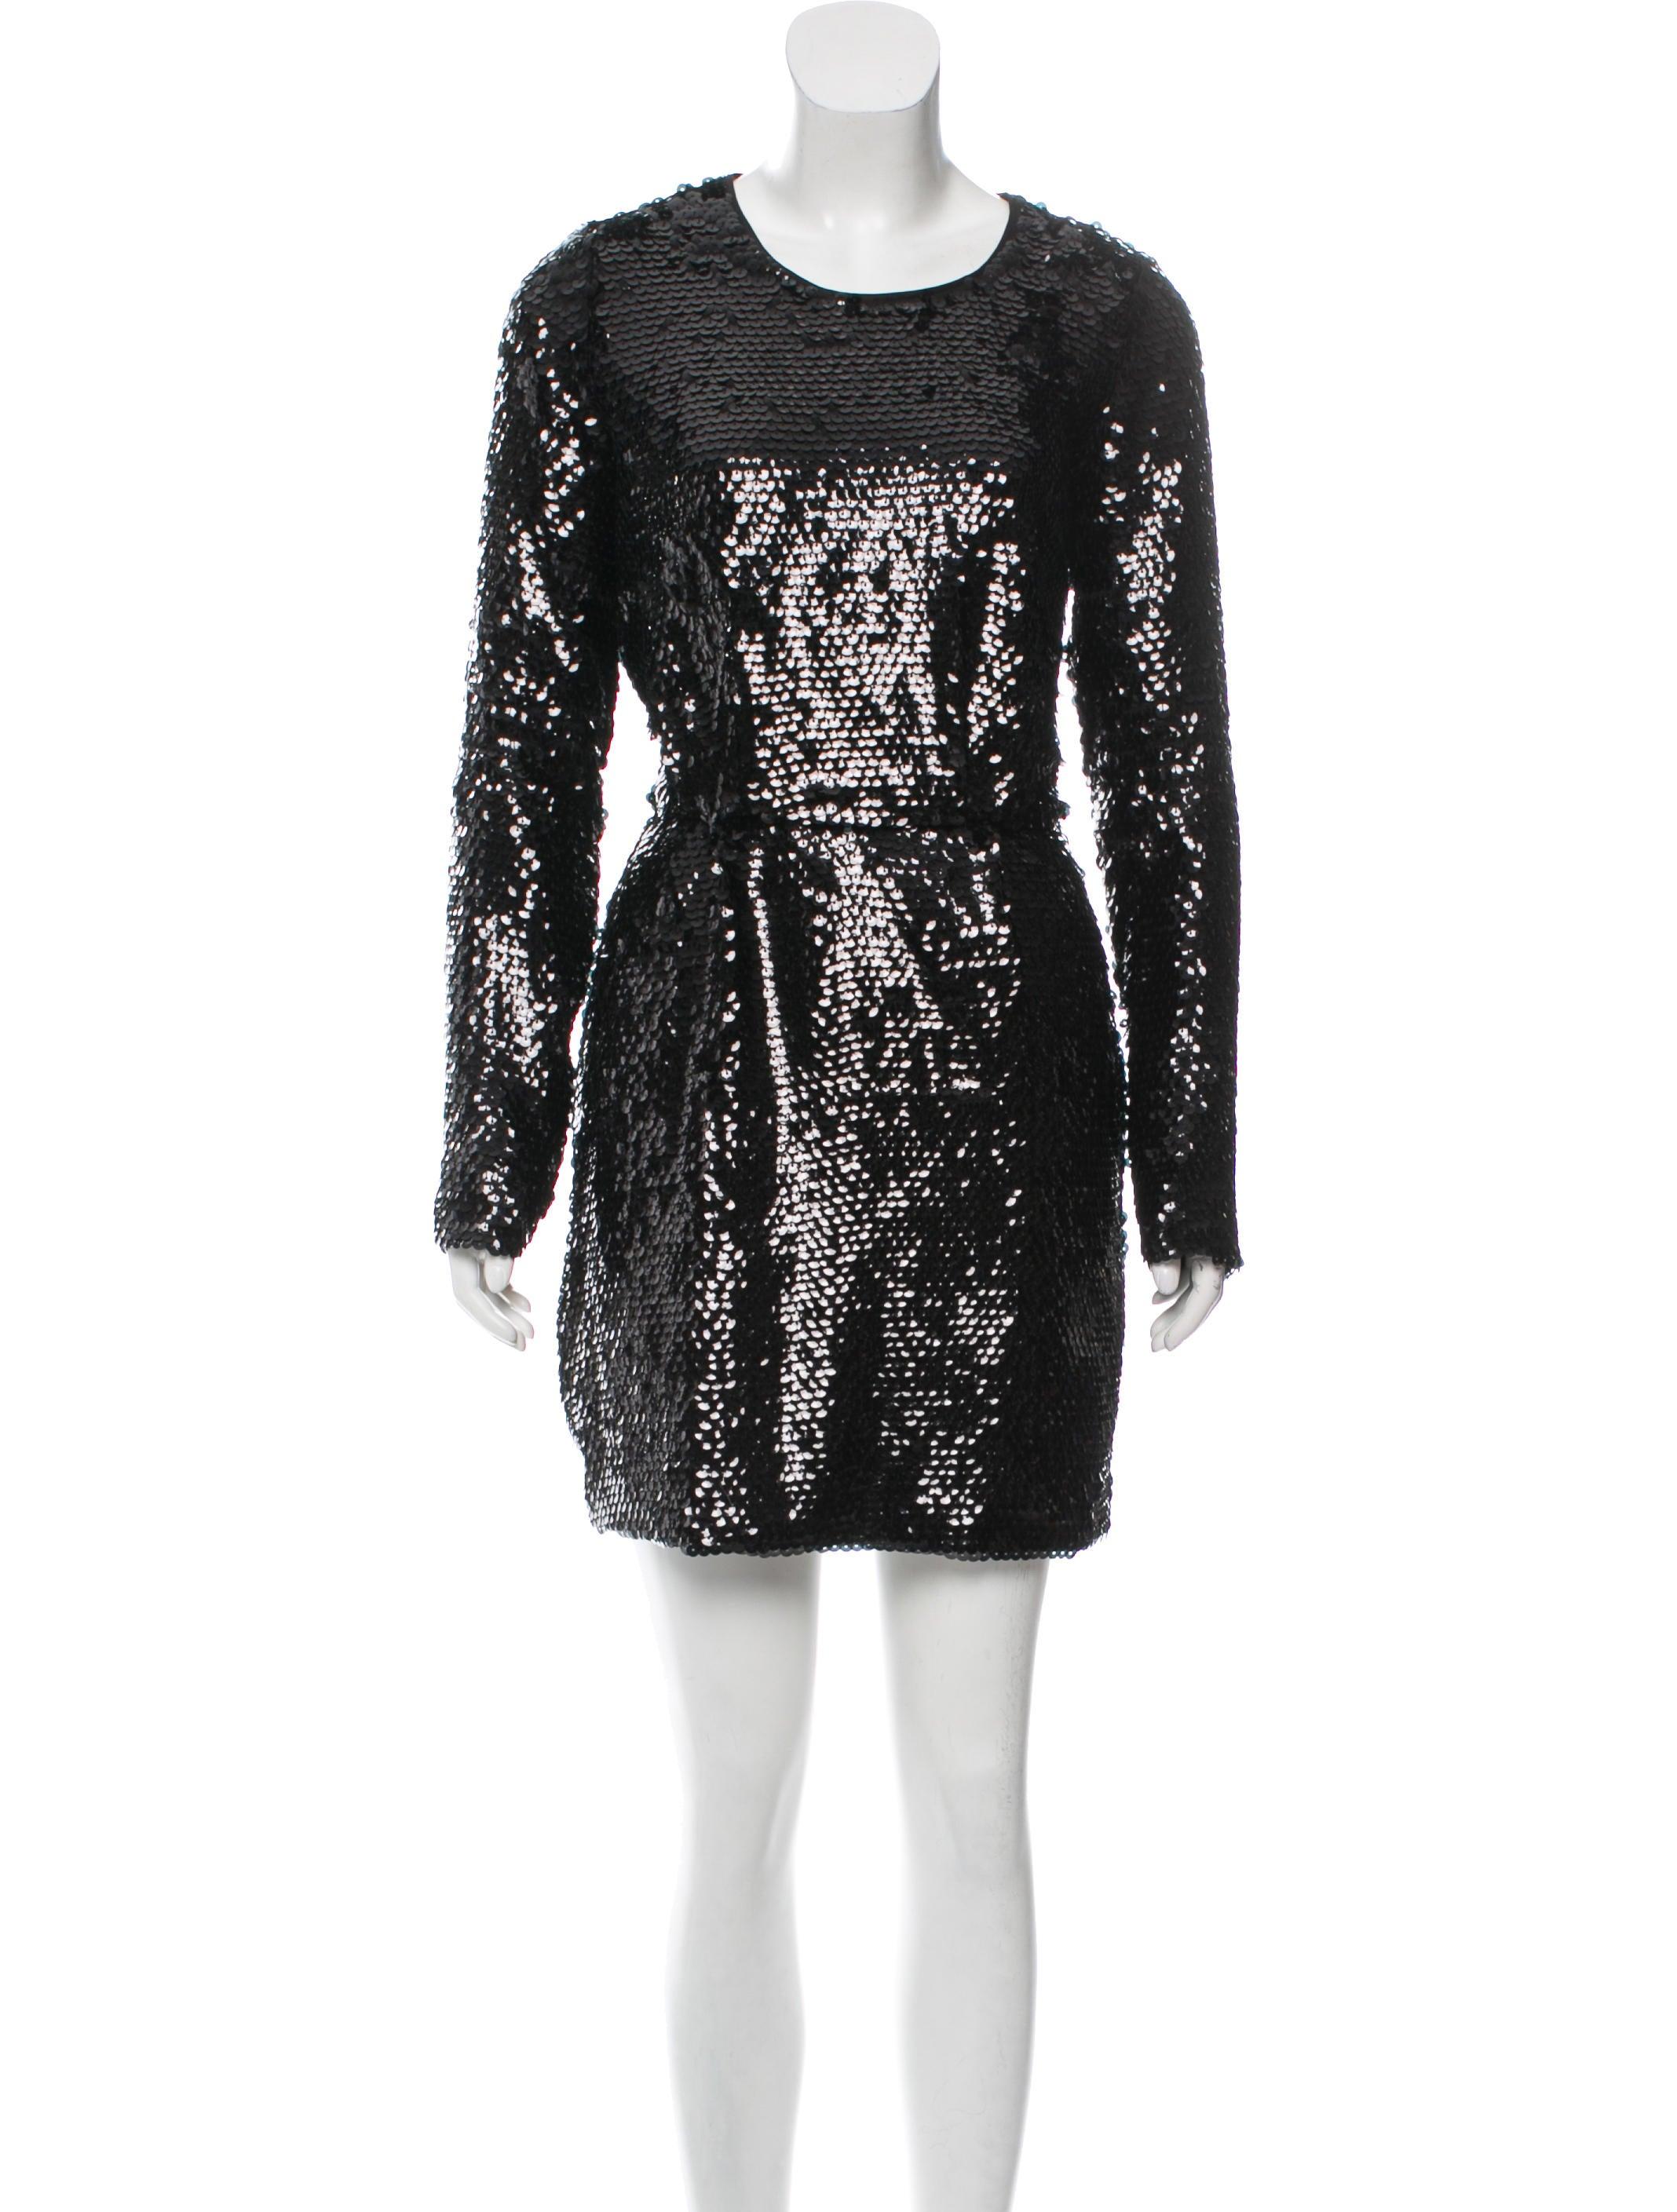 3d575e3efd8a Rachel Zoe Sequin Mini Dress - Clothing - WRL34100   The RealReal